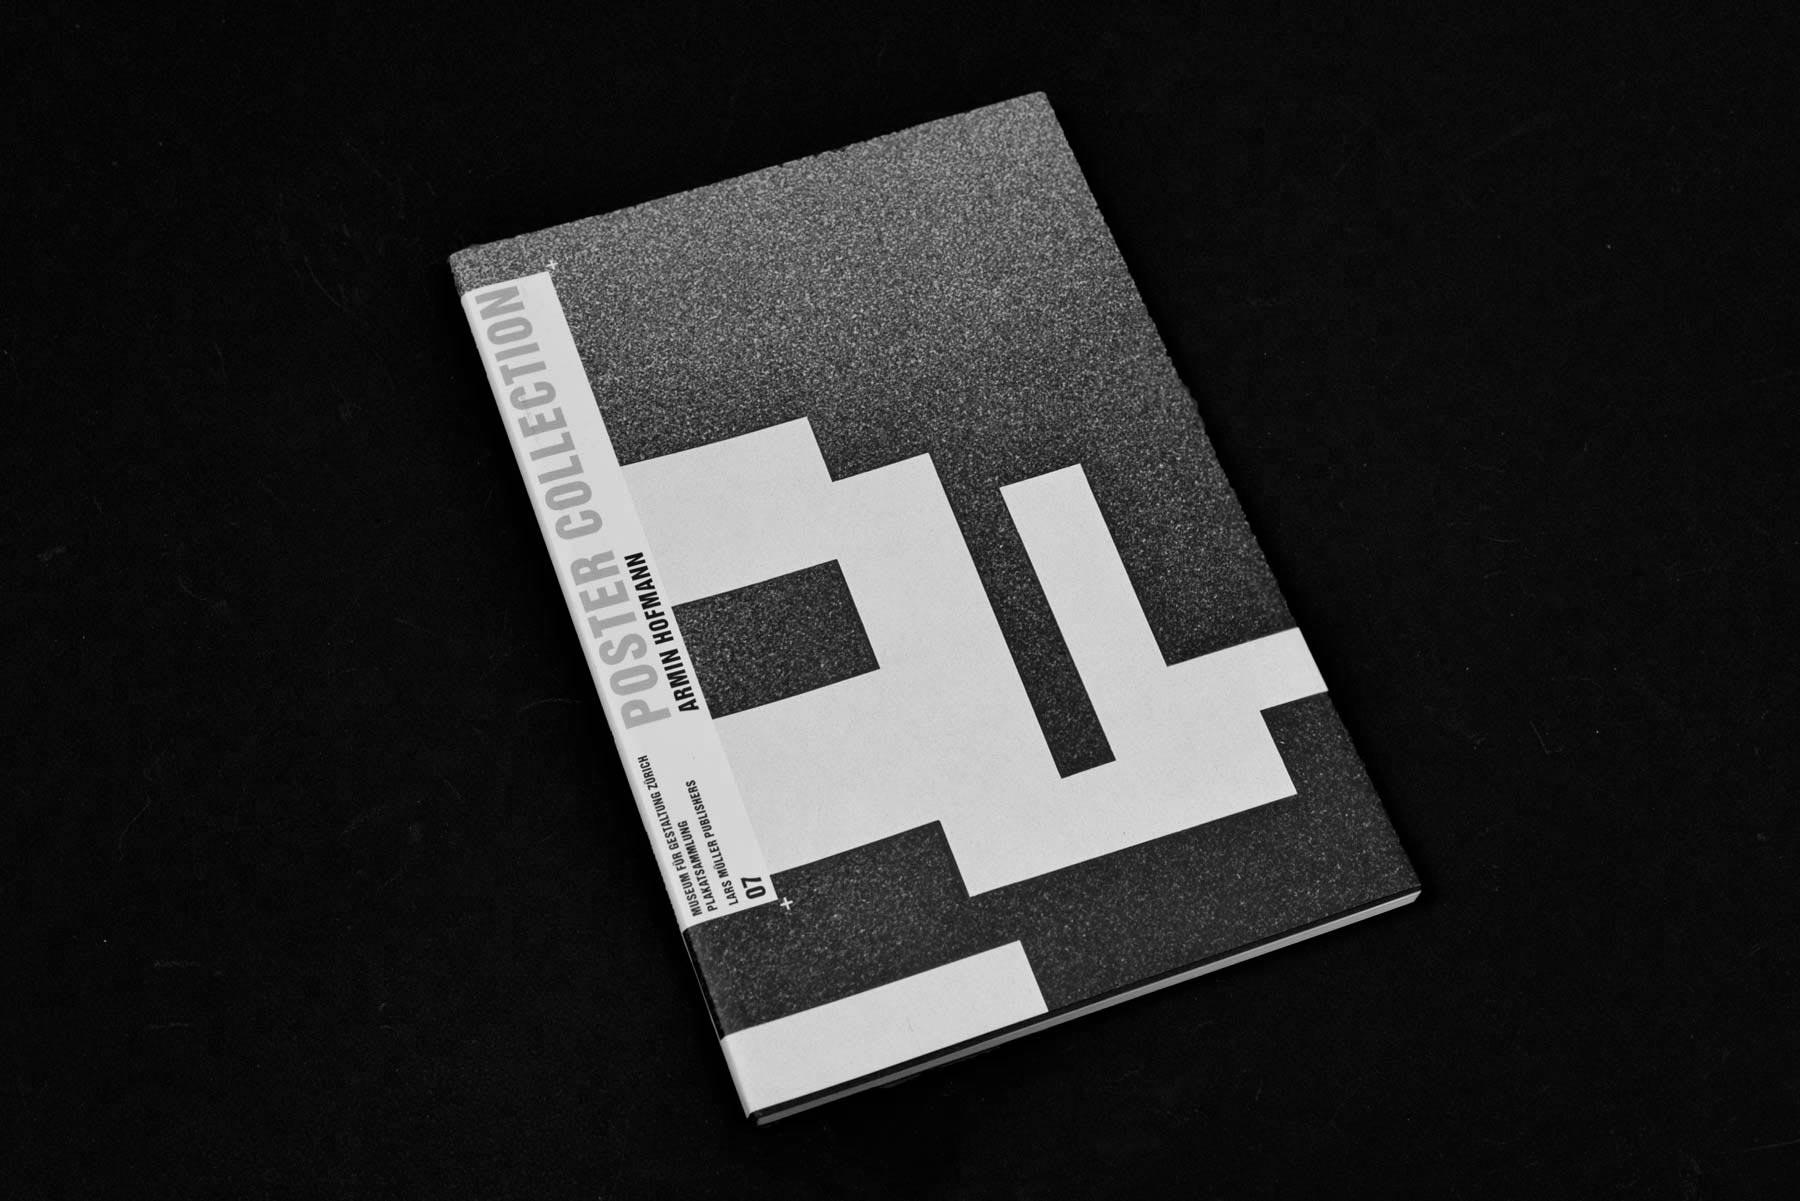 gdfs-library-armin-hoffman